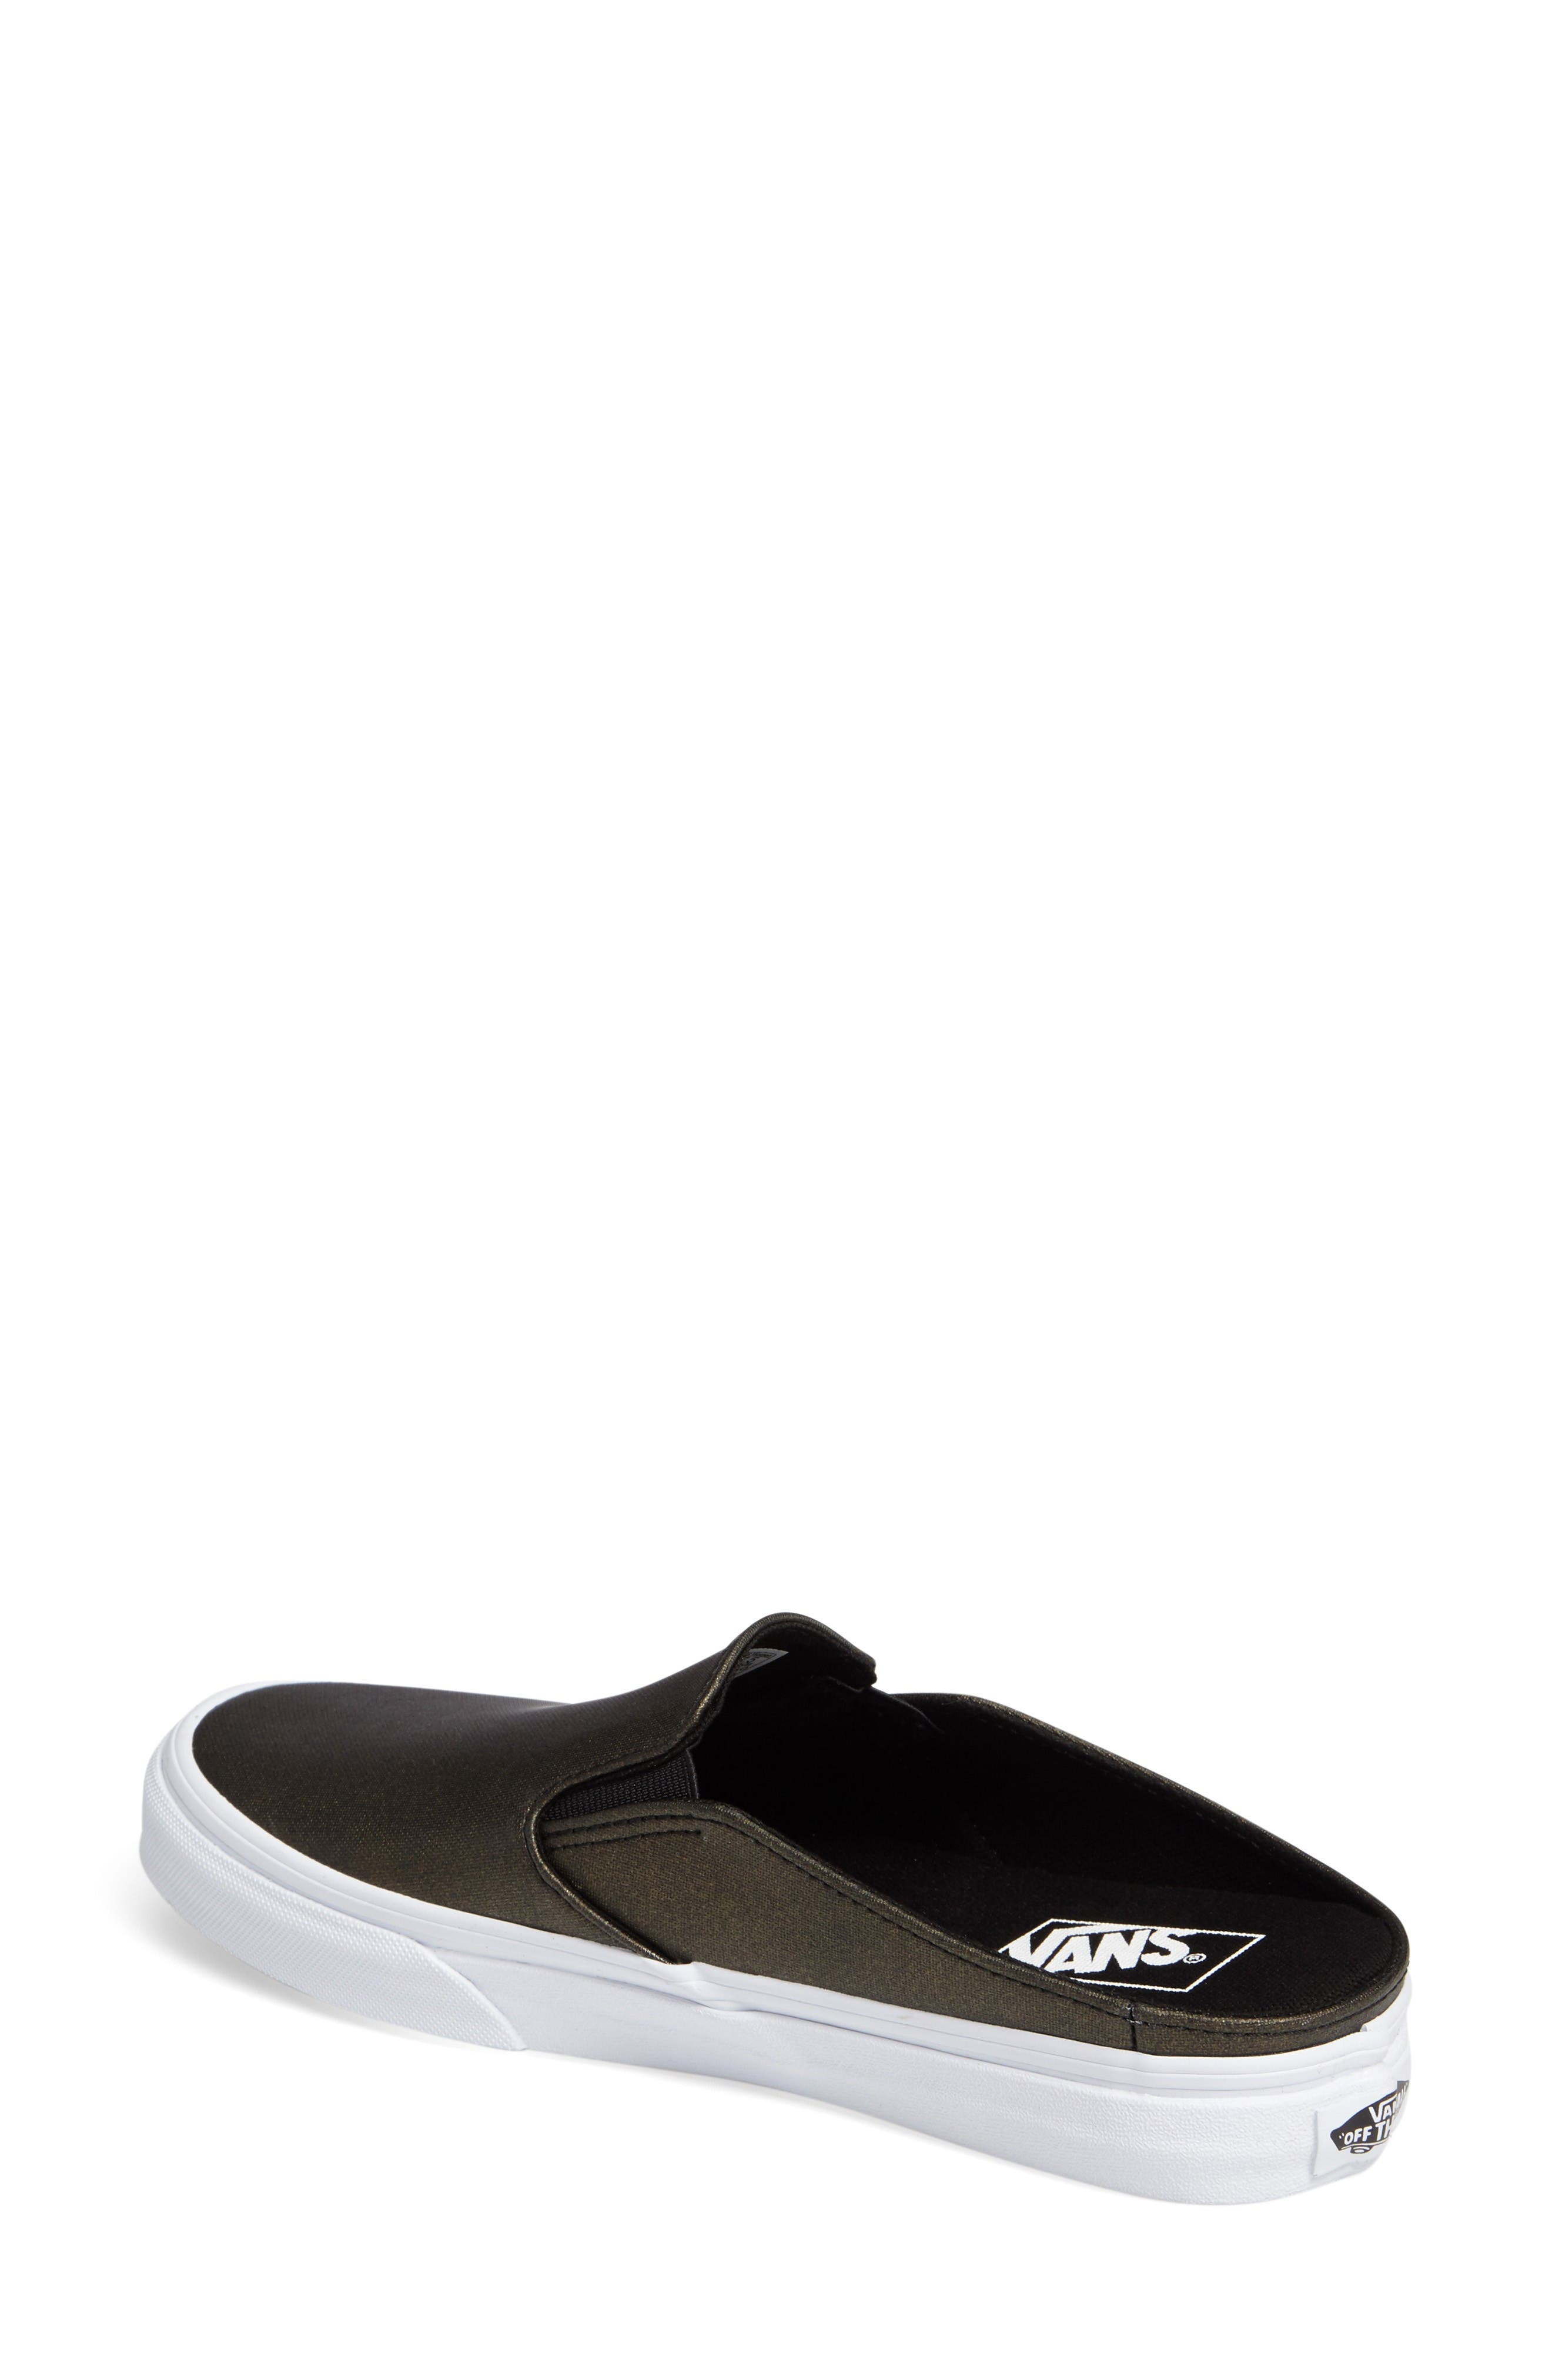 Alternate Image 2  - Vans 'Classic' Slip-On Sneaker Mule (Women)